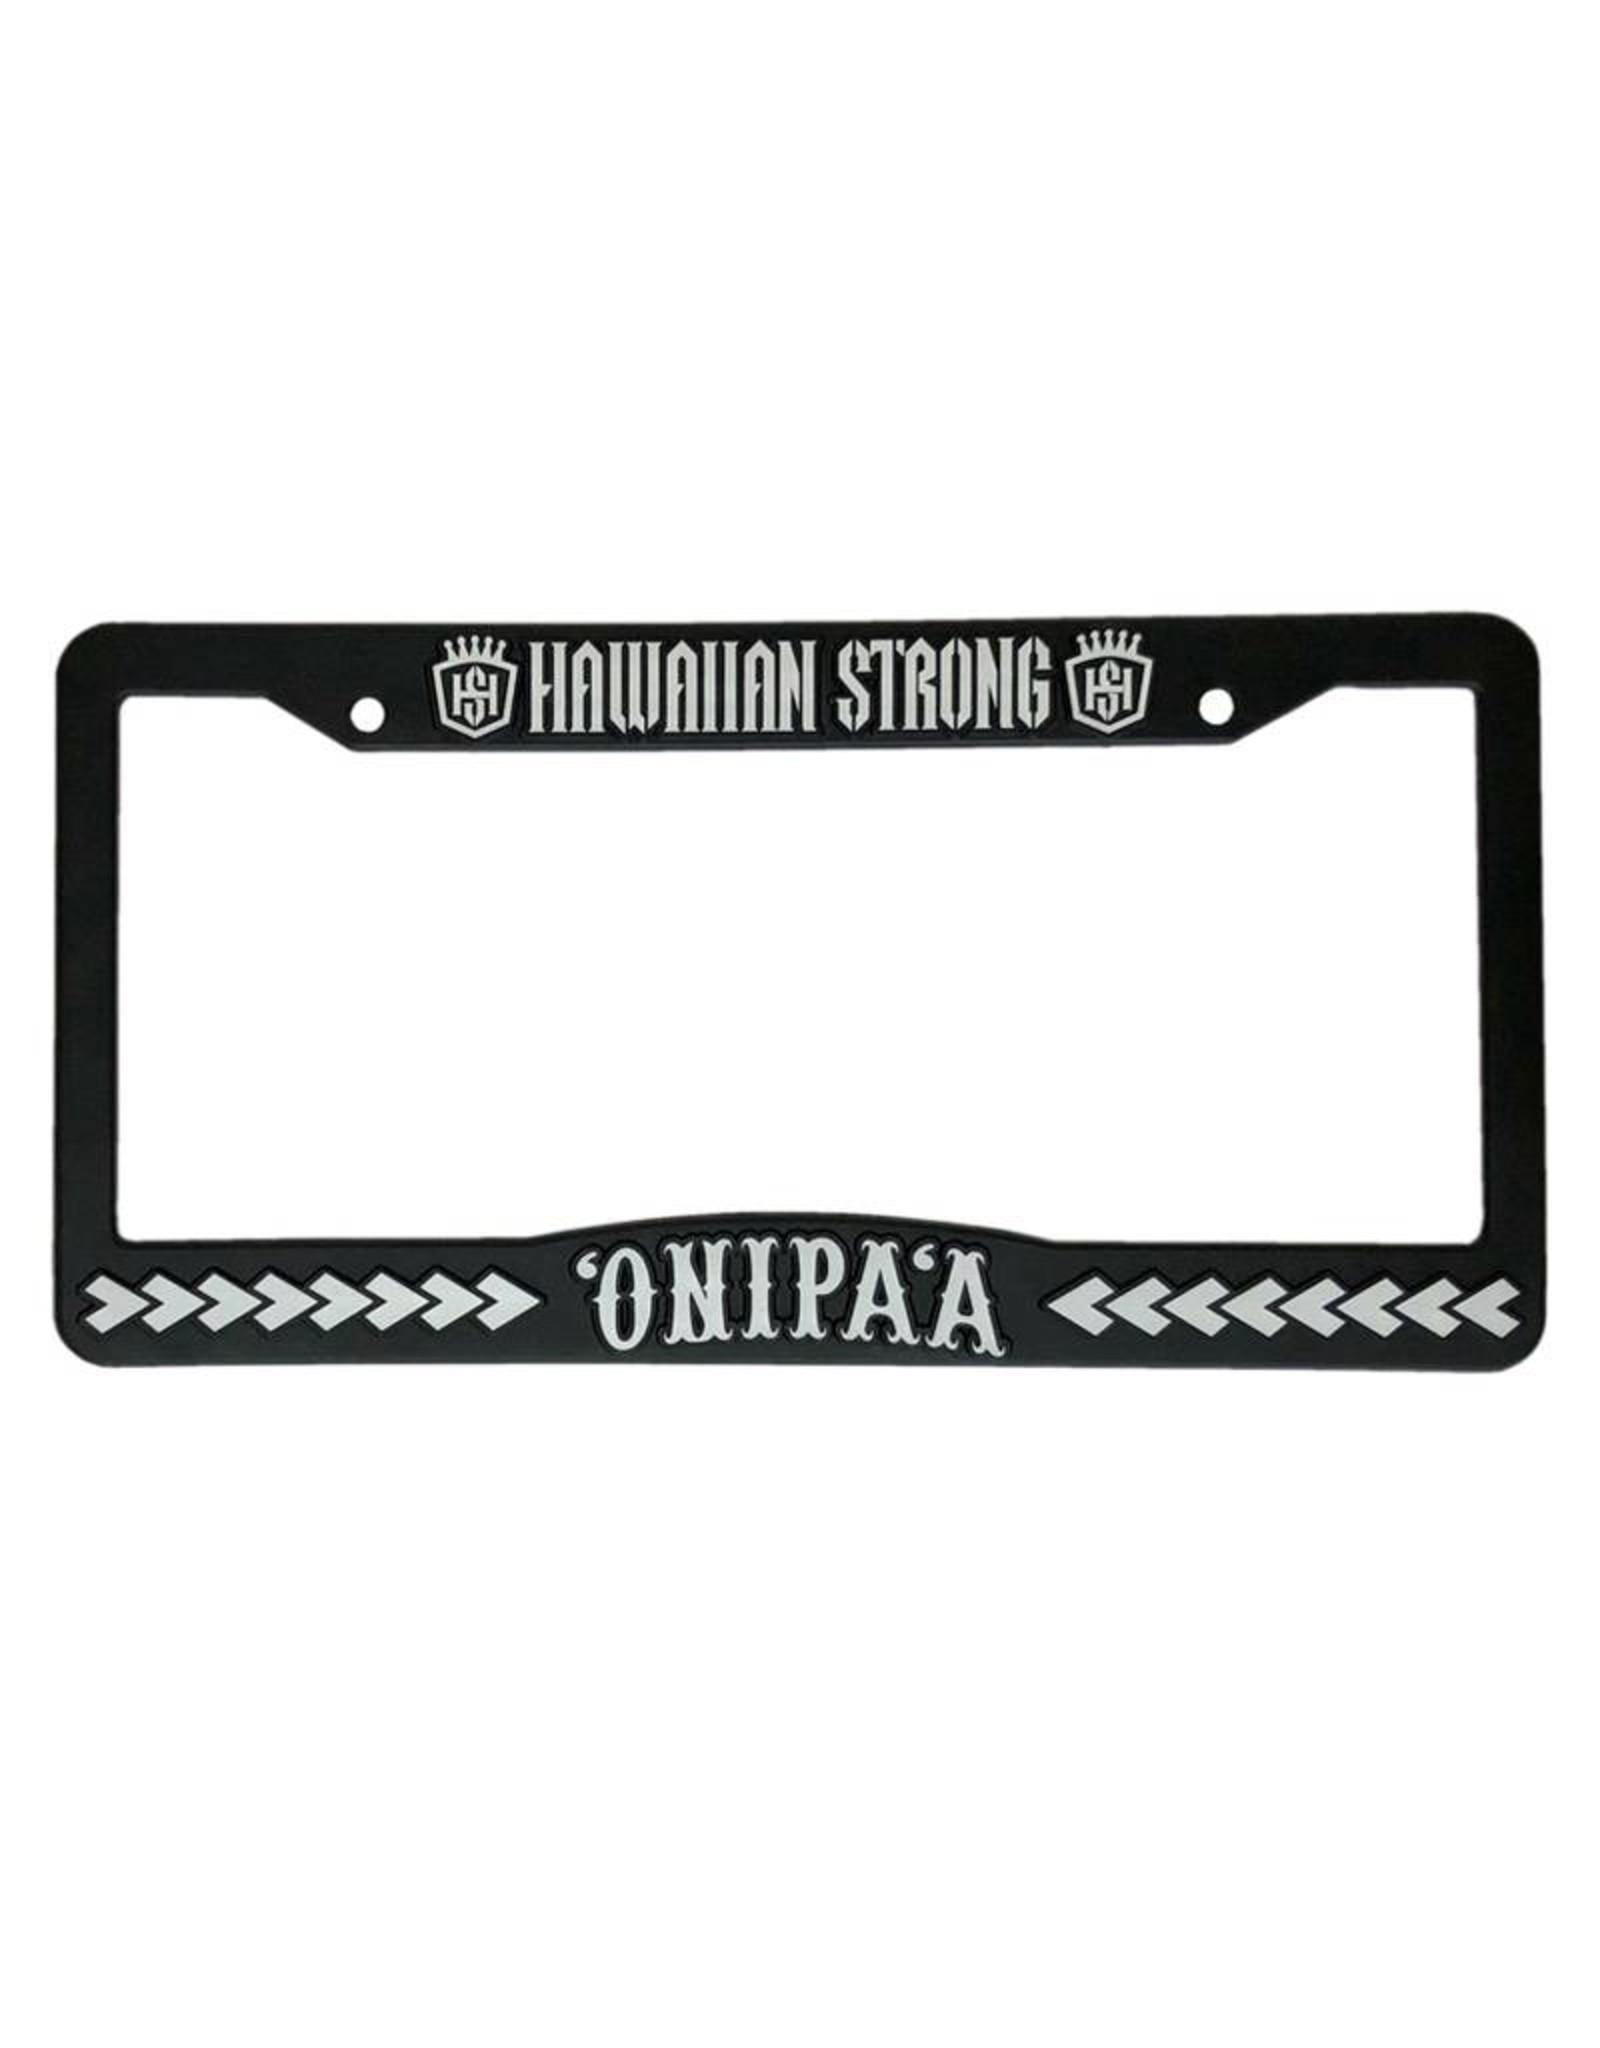 Hawaiian Strong 'ONIPA'A car plate